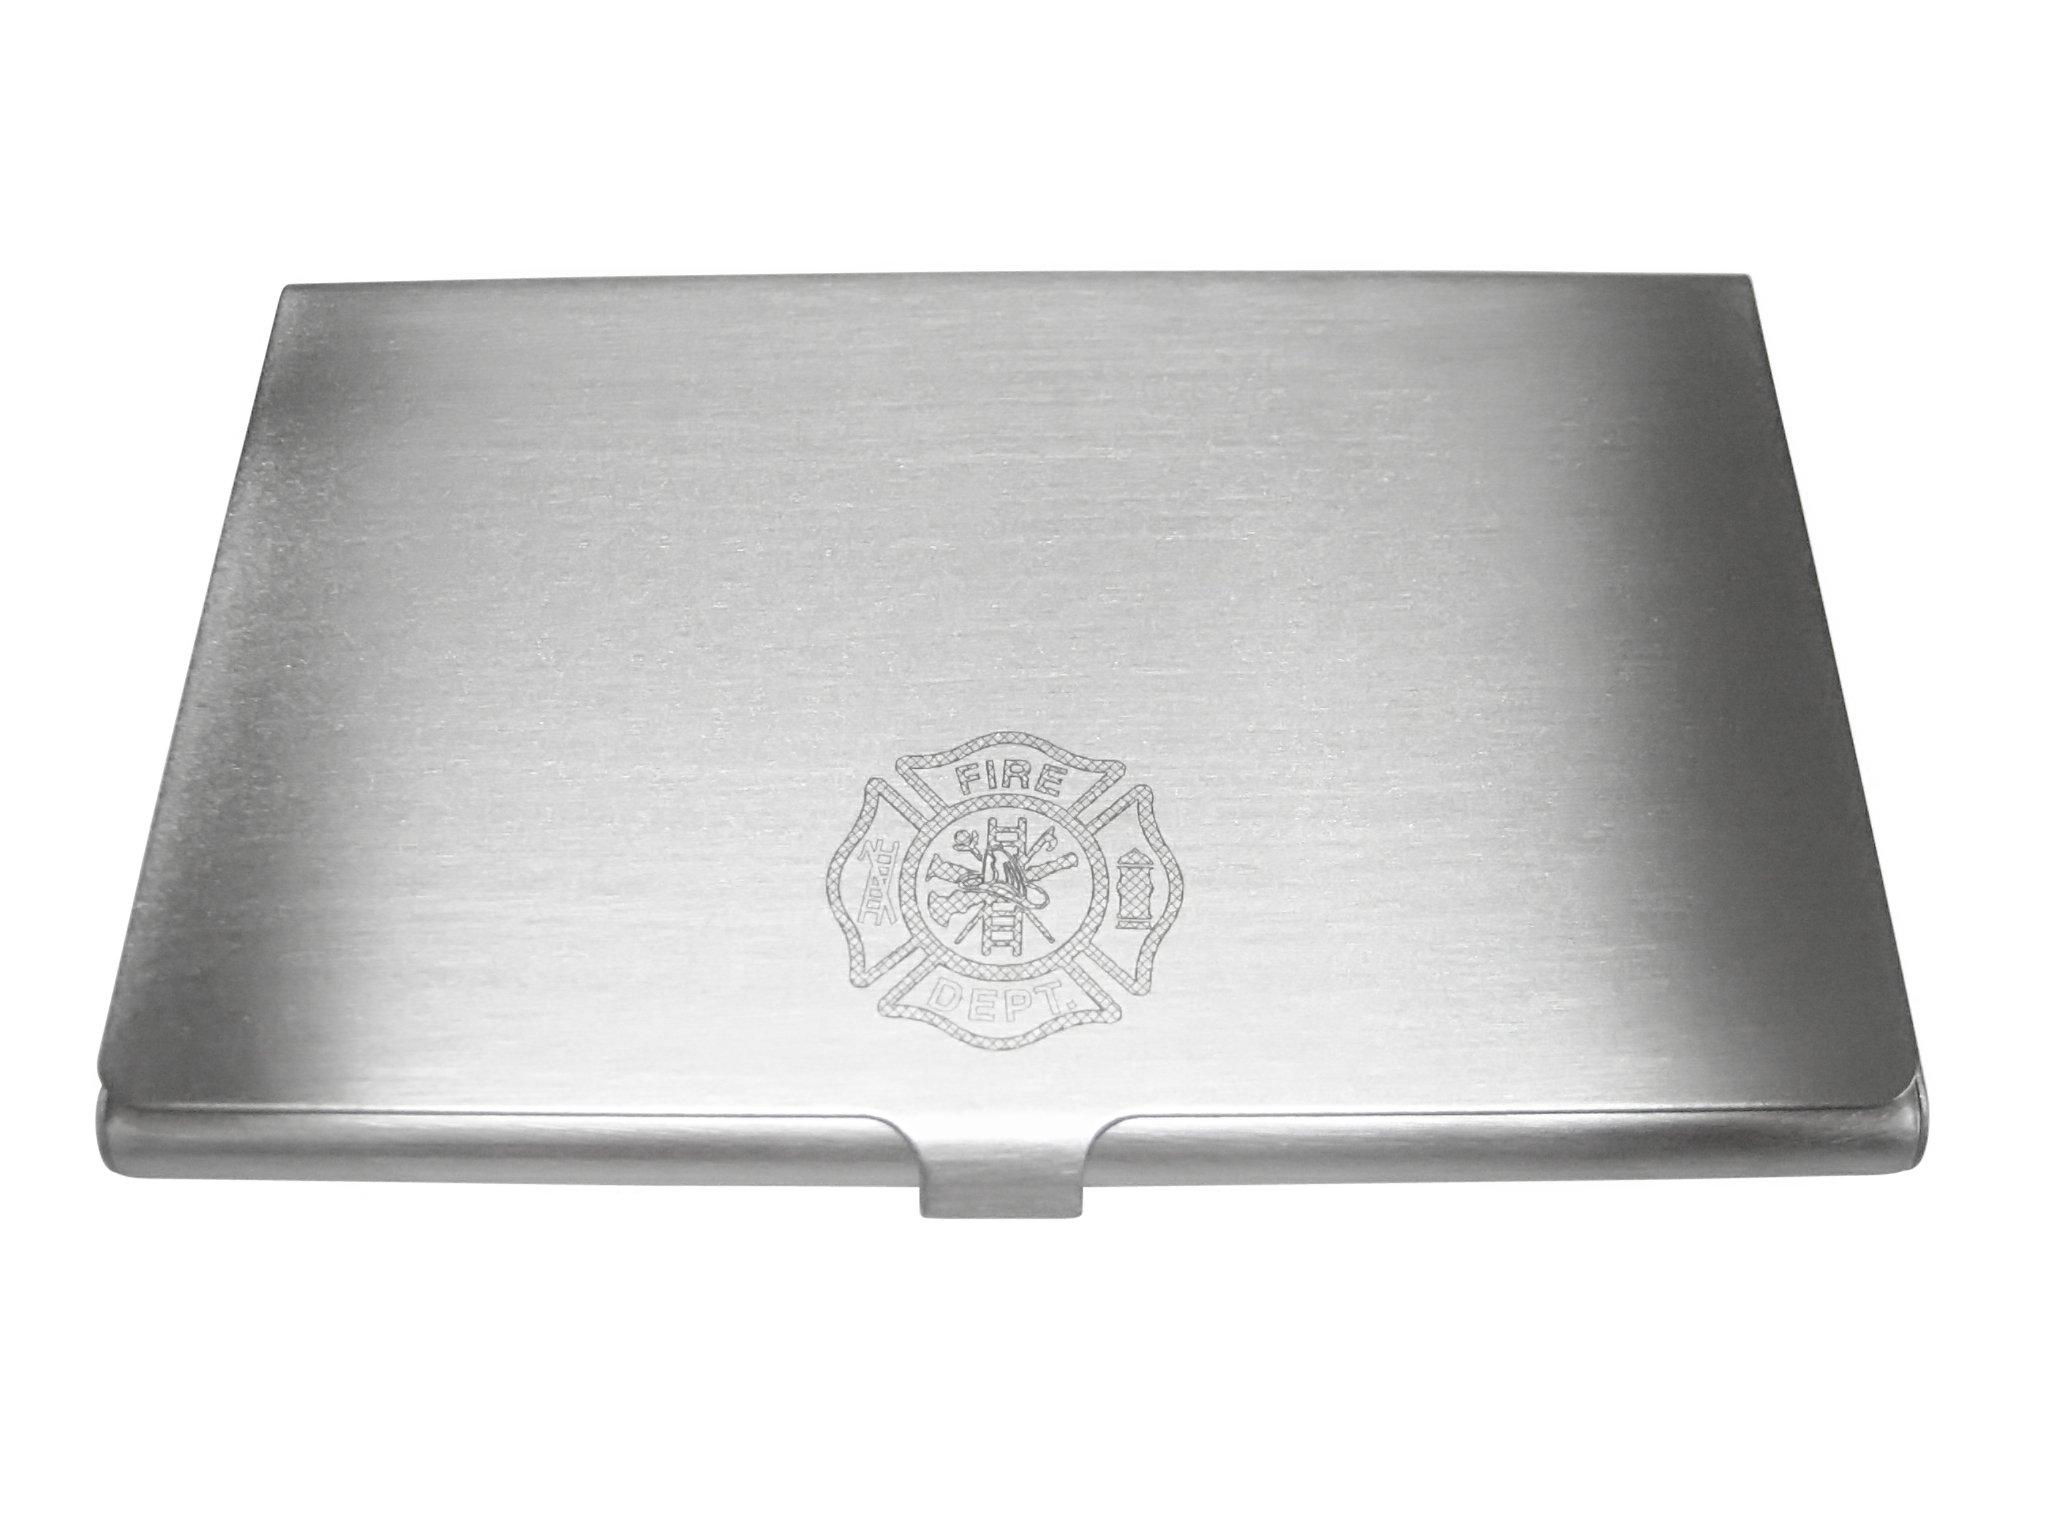 Silver Toned Etched Fire Fighter Emblem Business Card Holder